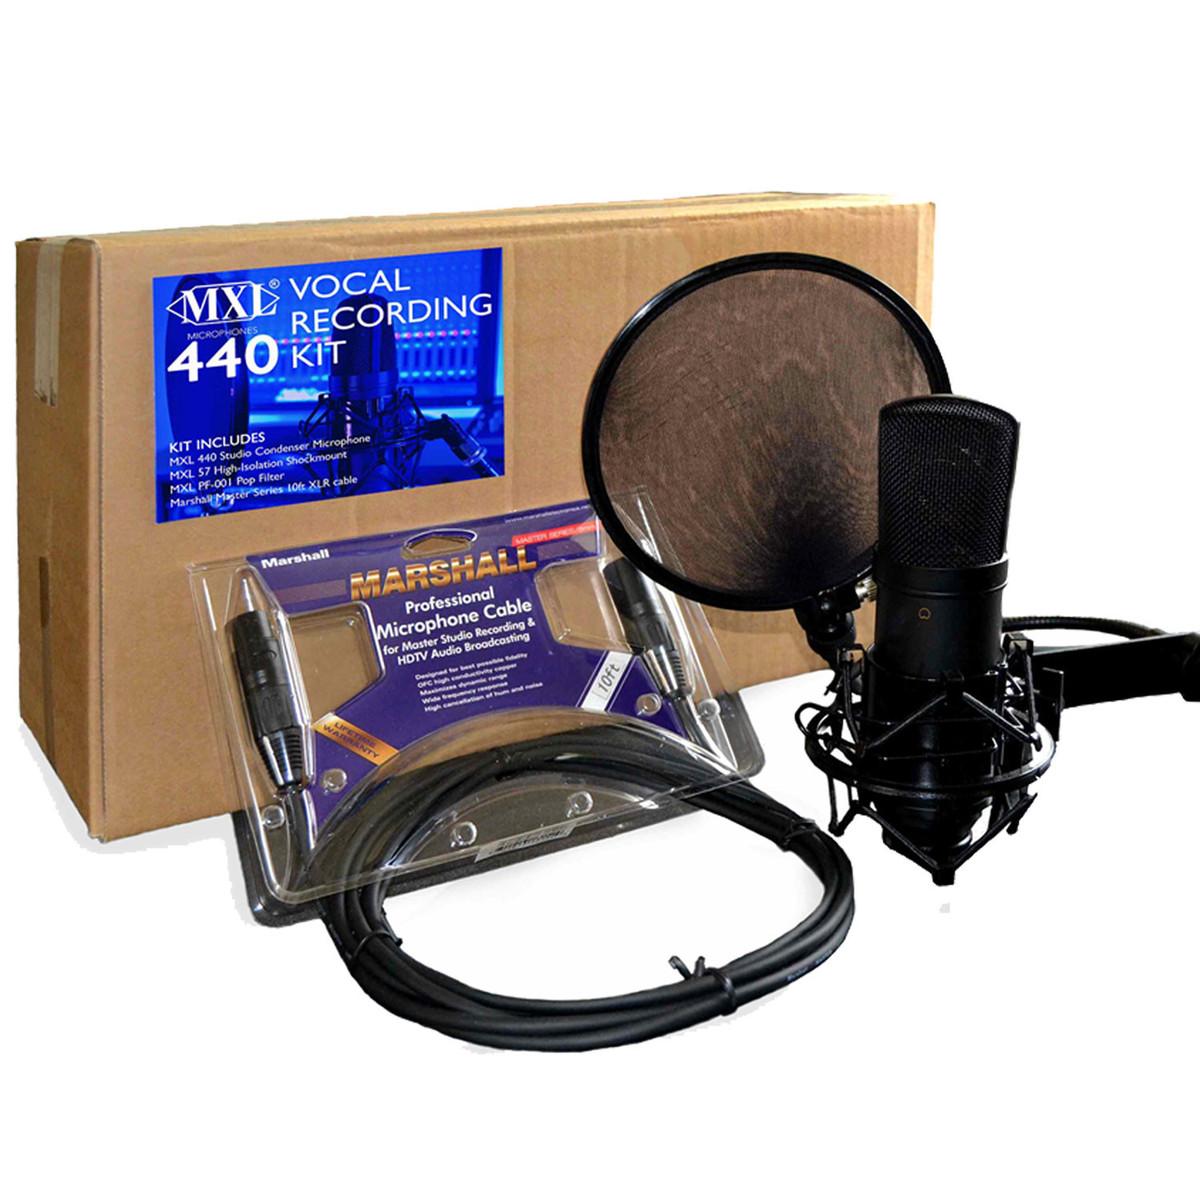 Image of MXL 440 Vocal Recording Kit